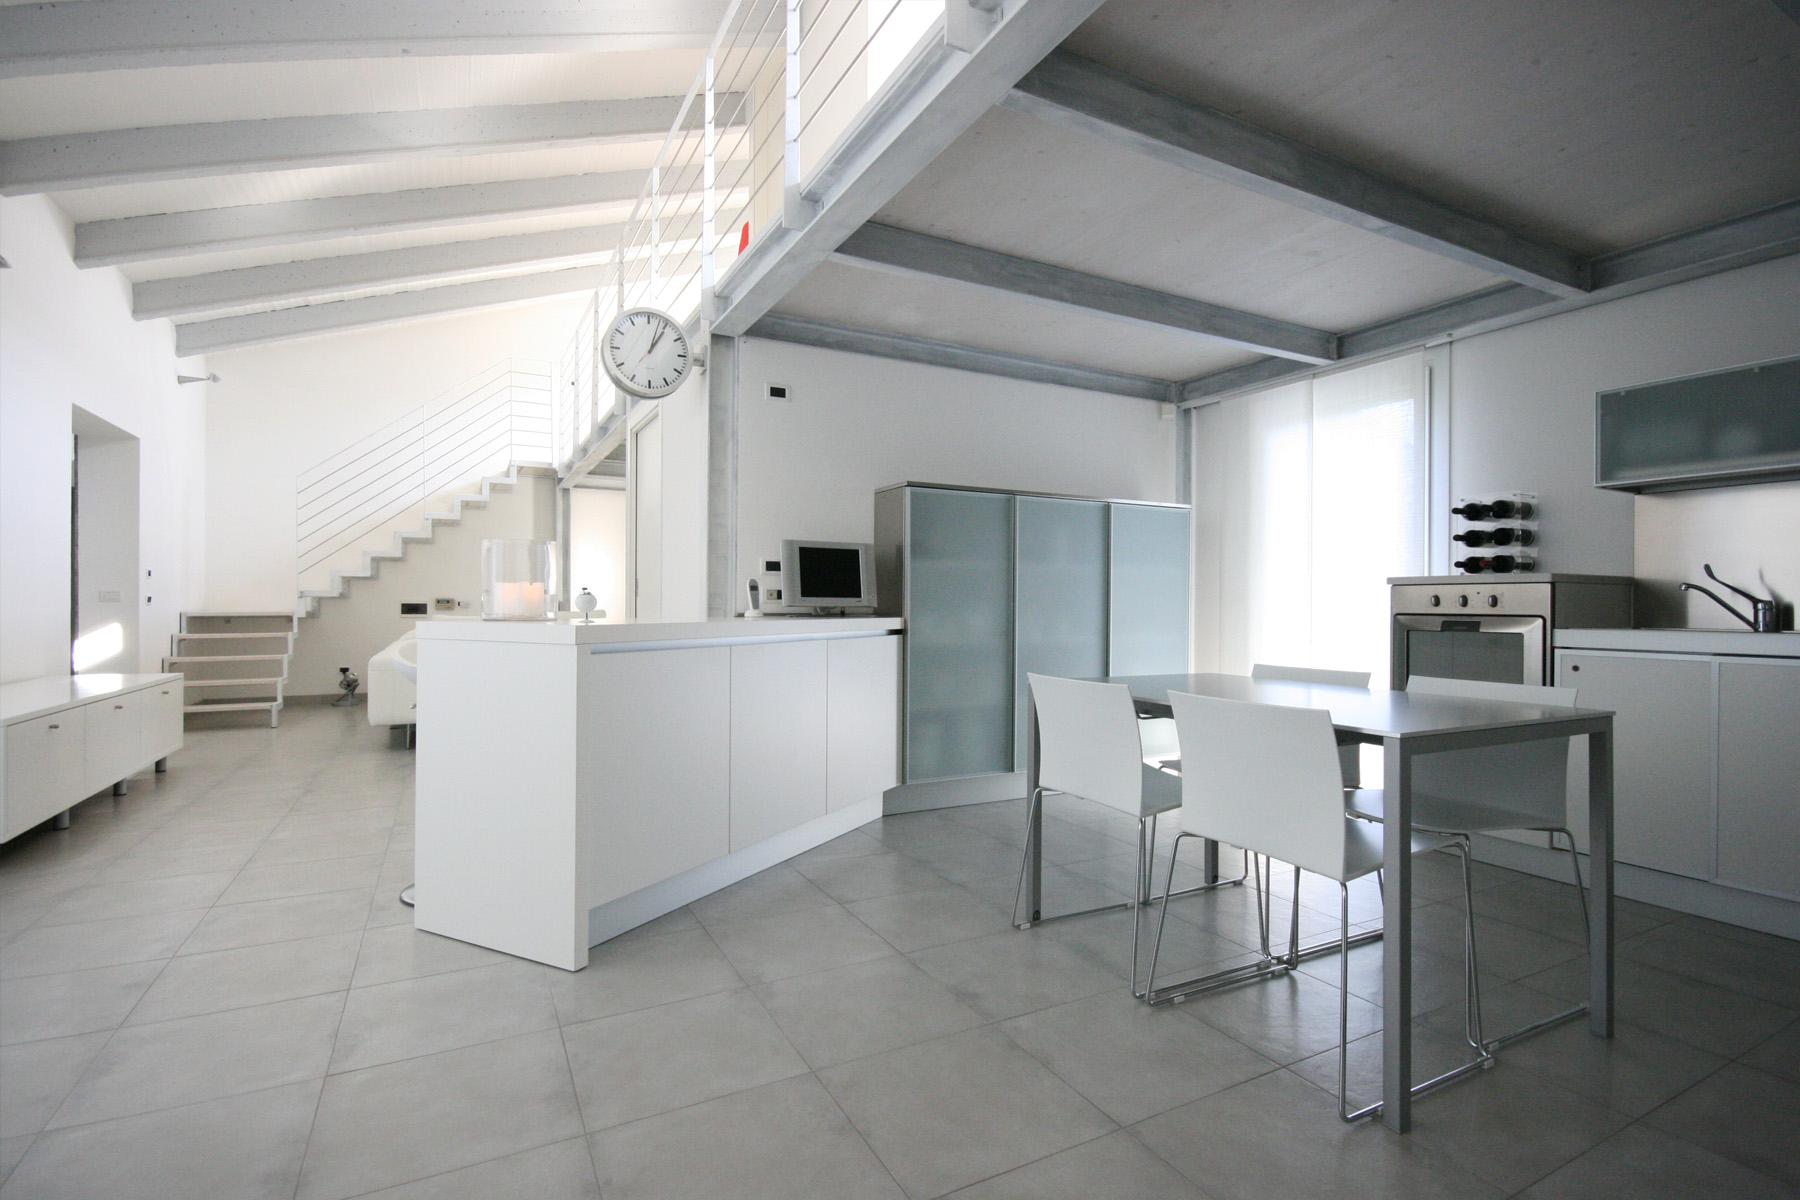 Soffitto travi a vista bianco mj65 regardsdefemmes Ambienti interni moderni